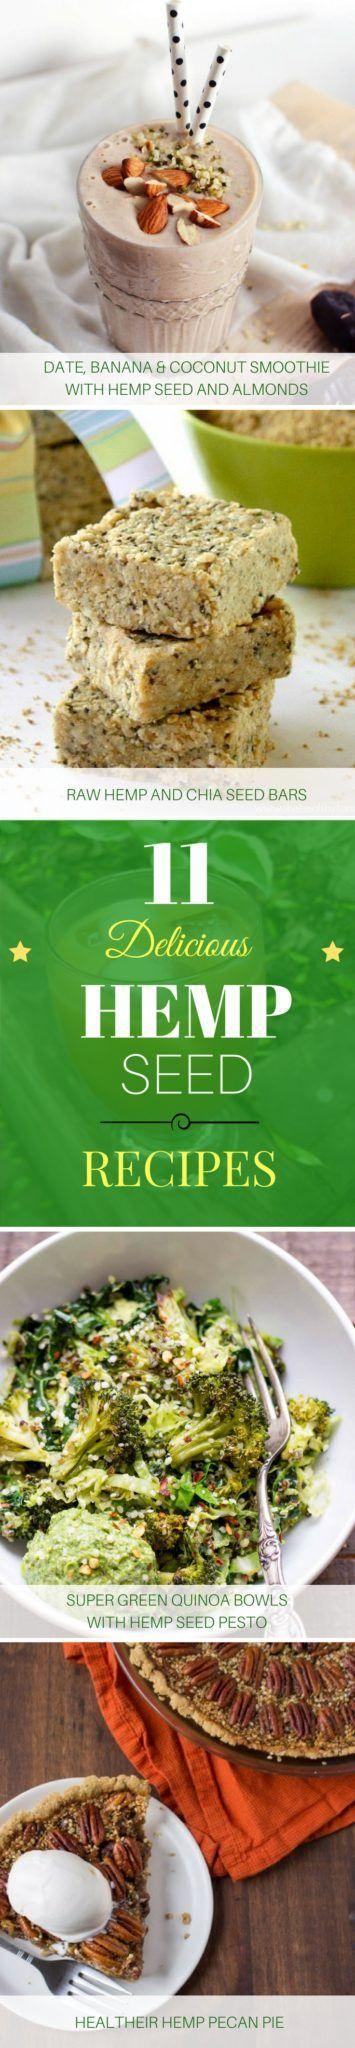 hemp seed recipes